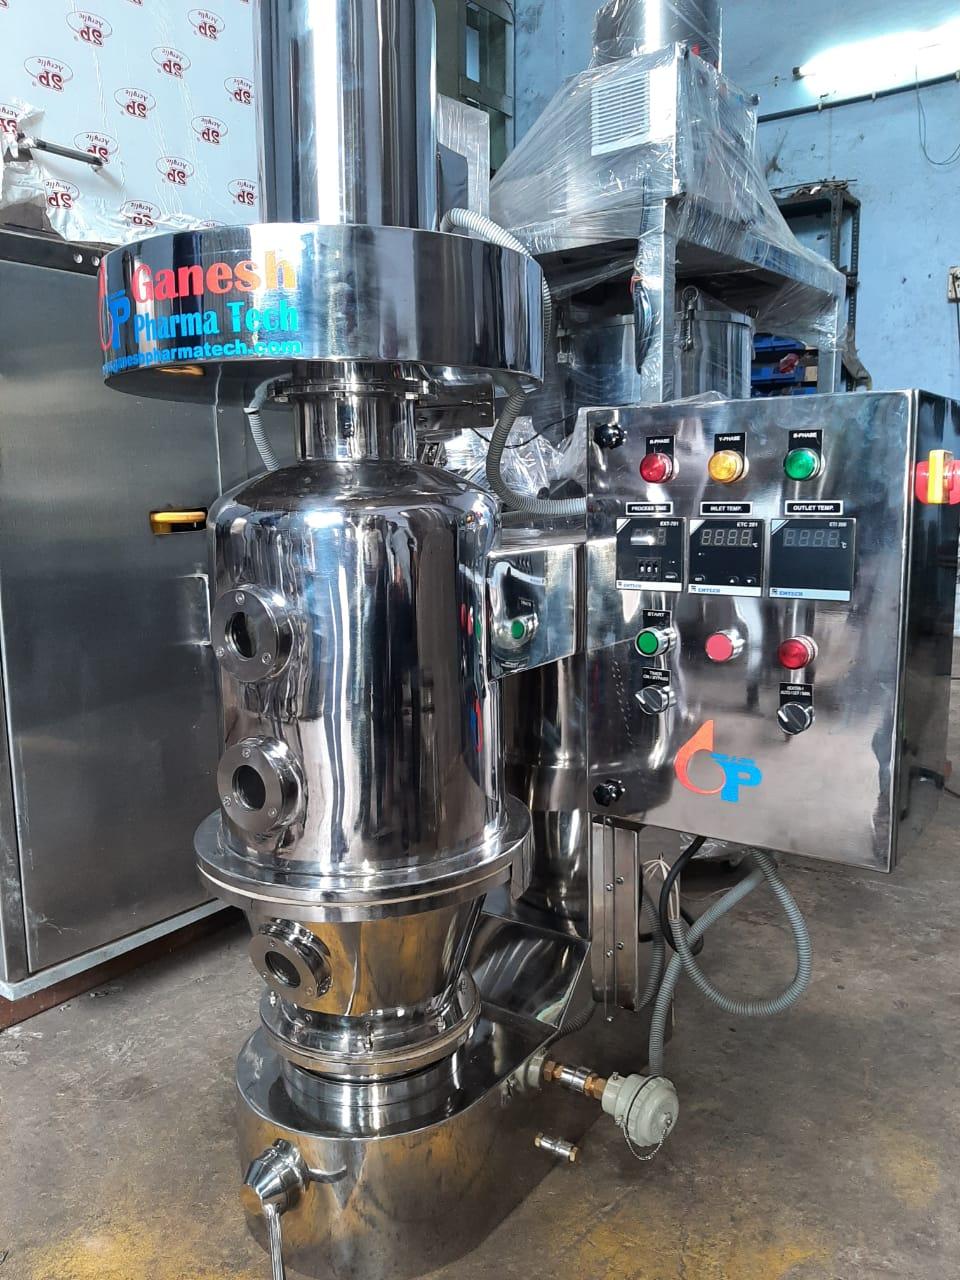 Fluid Bed Dryer Exporter in Bahrain,Iran,Iraq,Kuwait, Oman, Qatar, Saudi Arabia